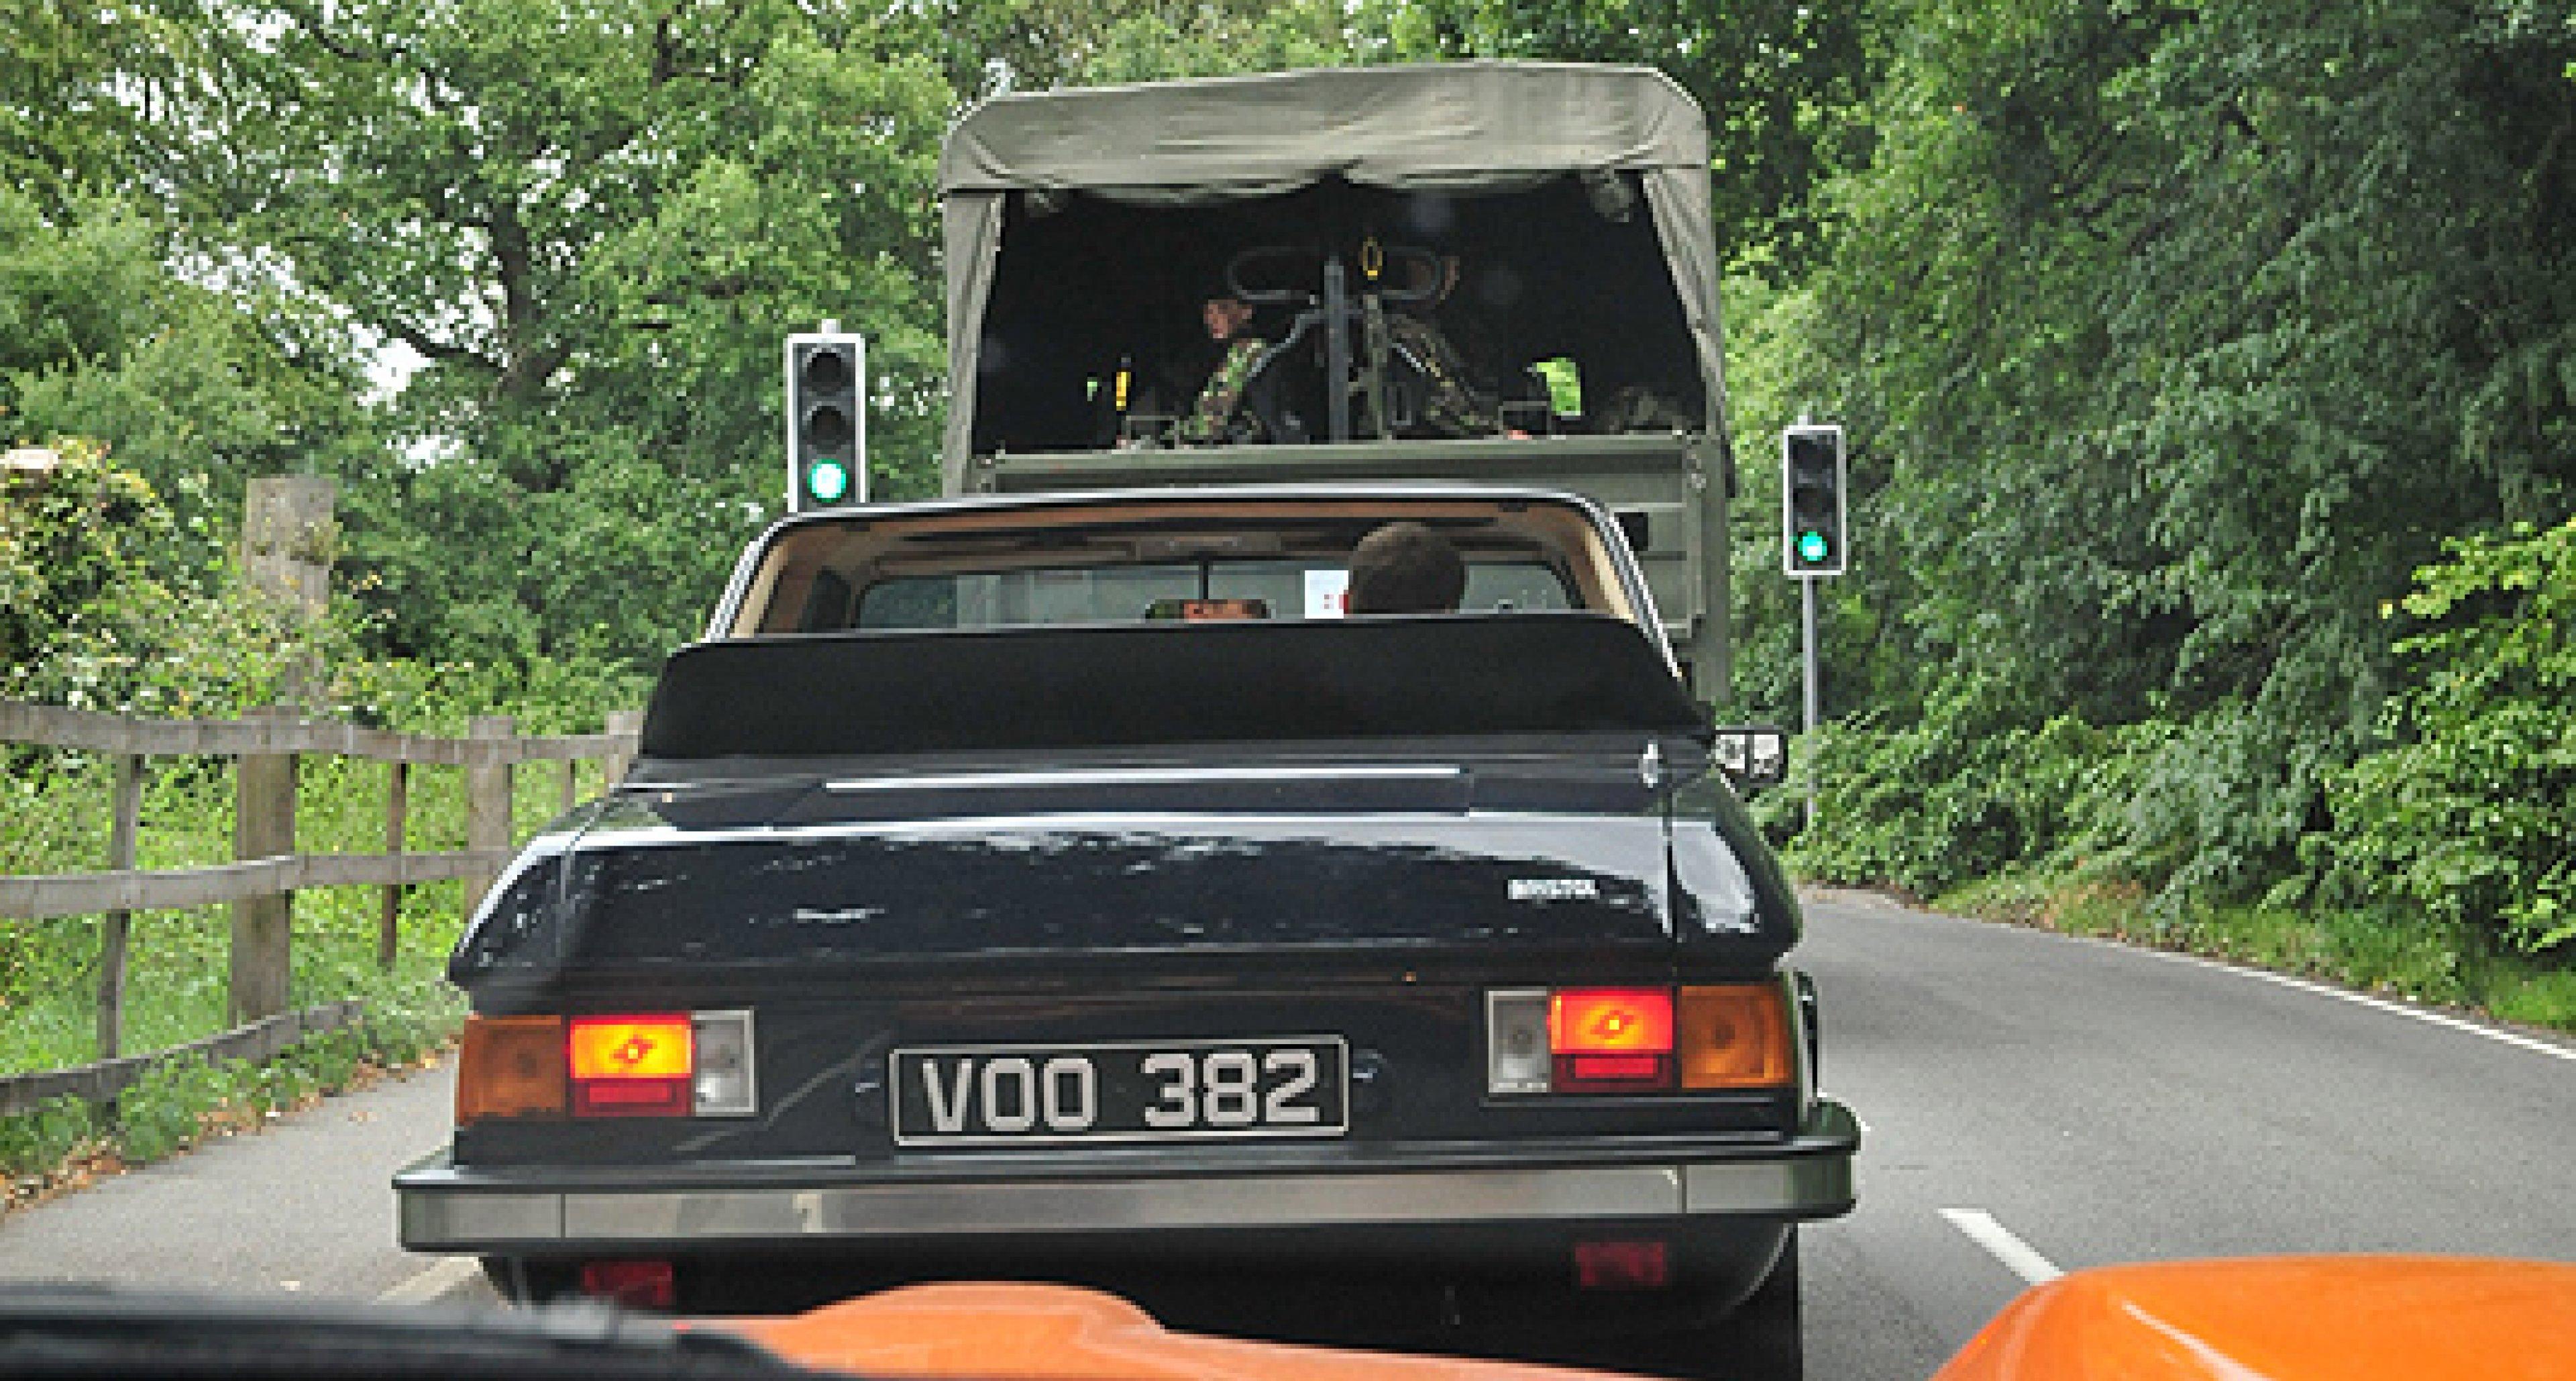 From Kensington to Camberley: Bristol car cavalcade stops London traffic